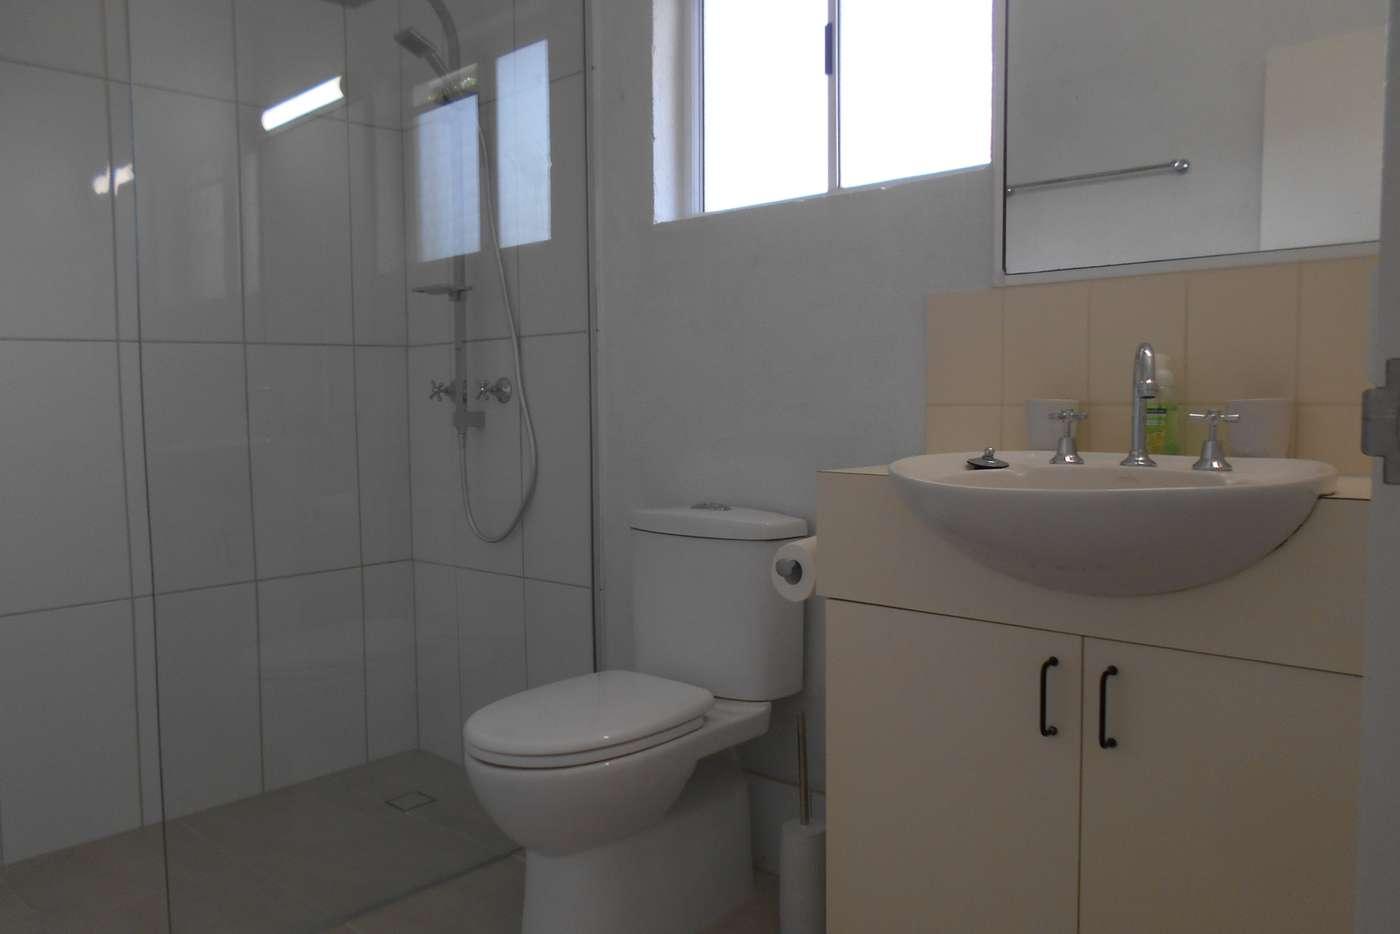 Seventh view of Homely apartment listing, Villa 143 Reef Resort 121 Port Douglas Rd, Port Douglas QLD 4877